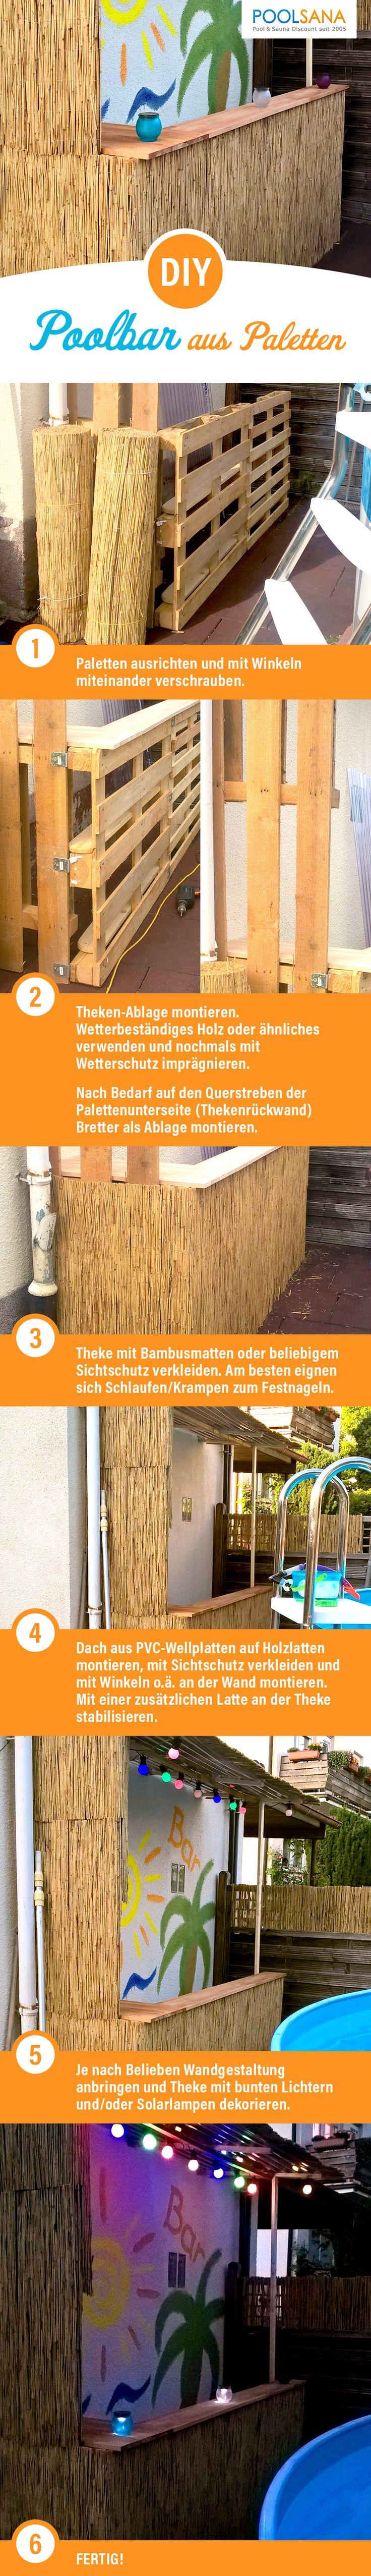 54 best garden¤ images on Pinterest | Garden ideas, House porch and ...